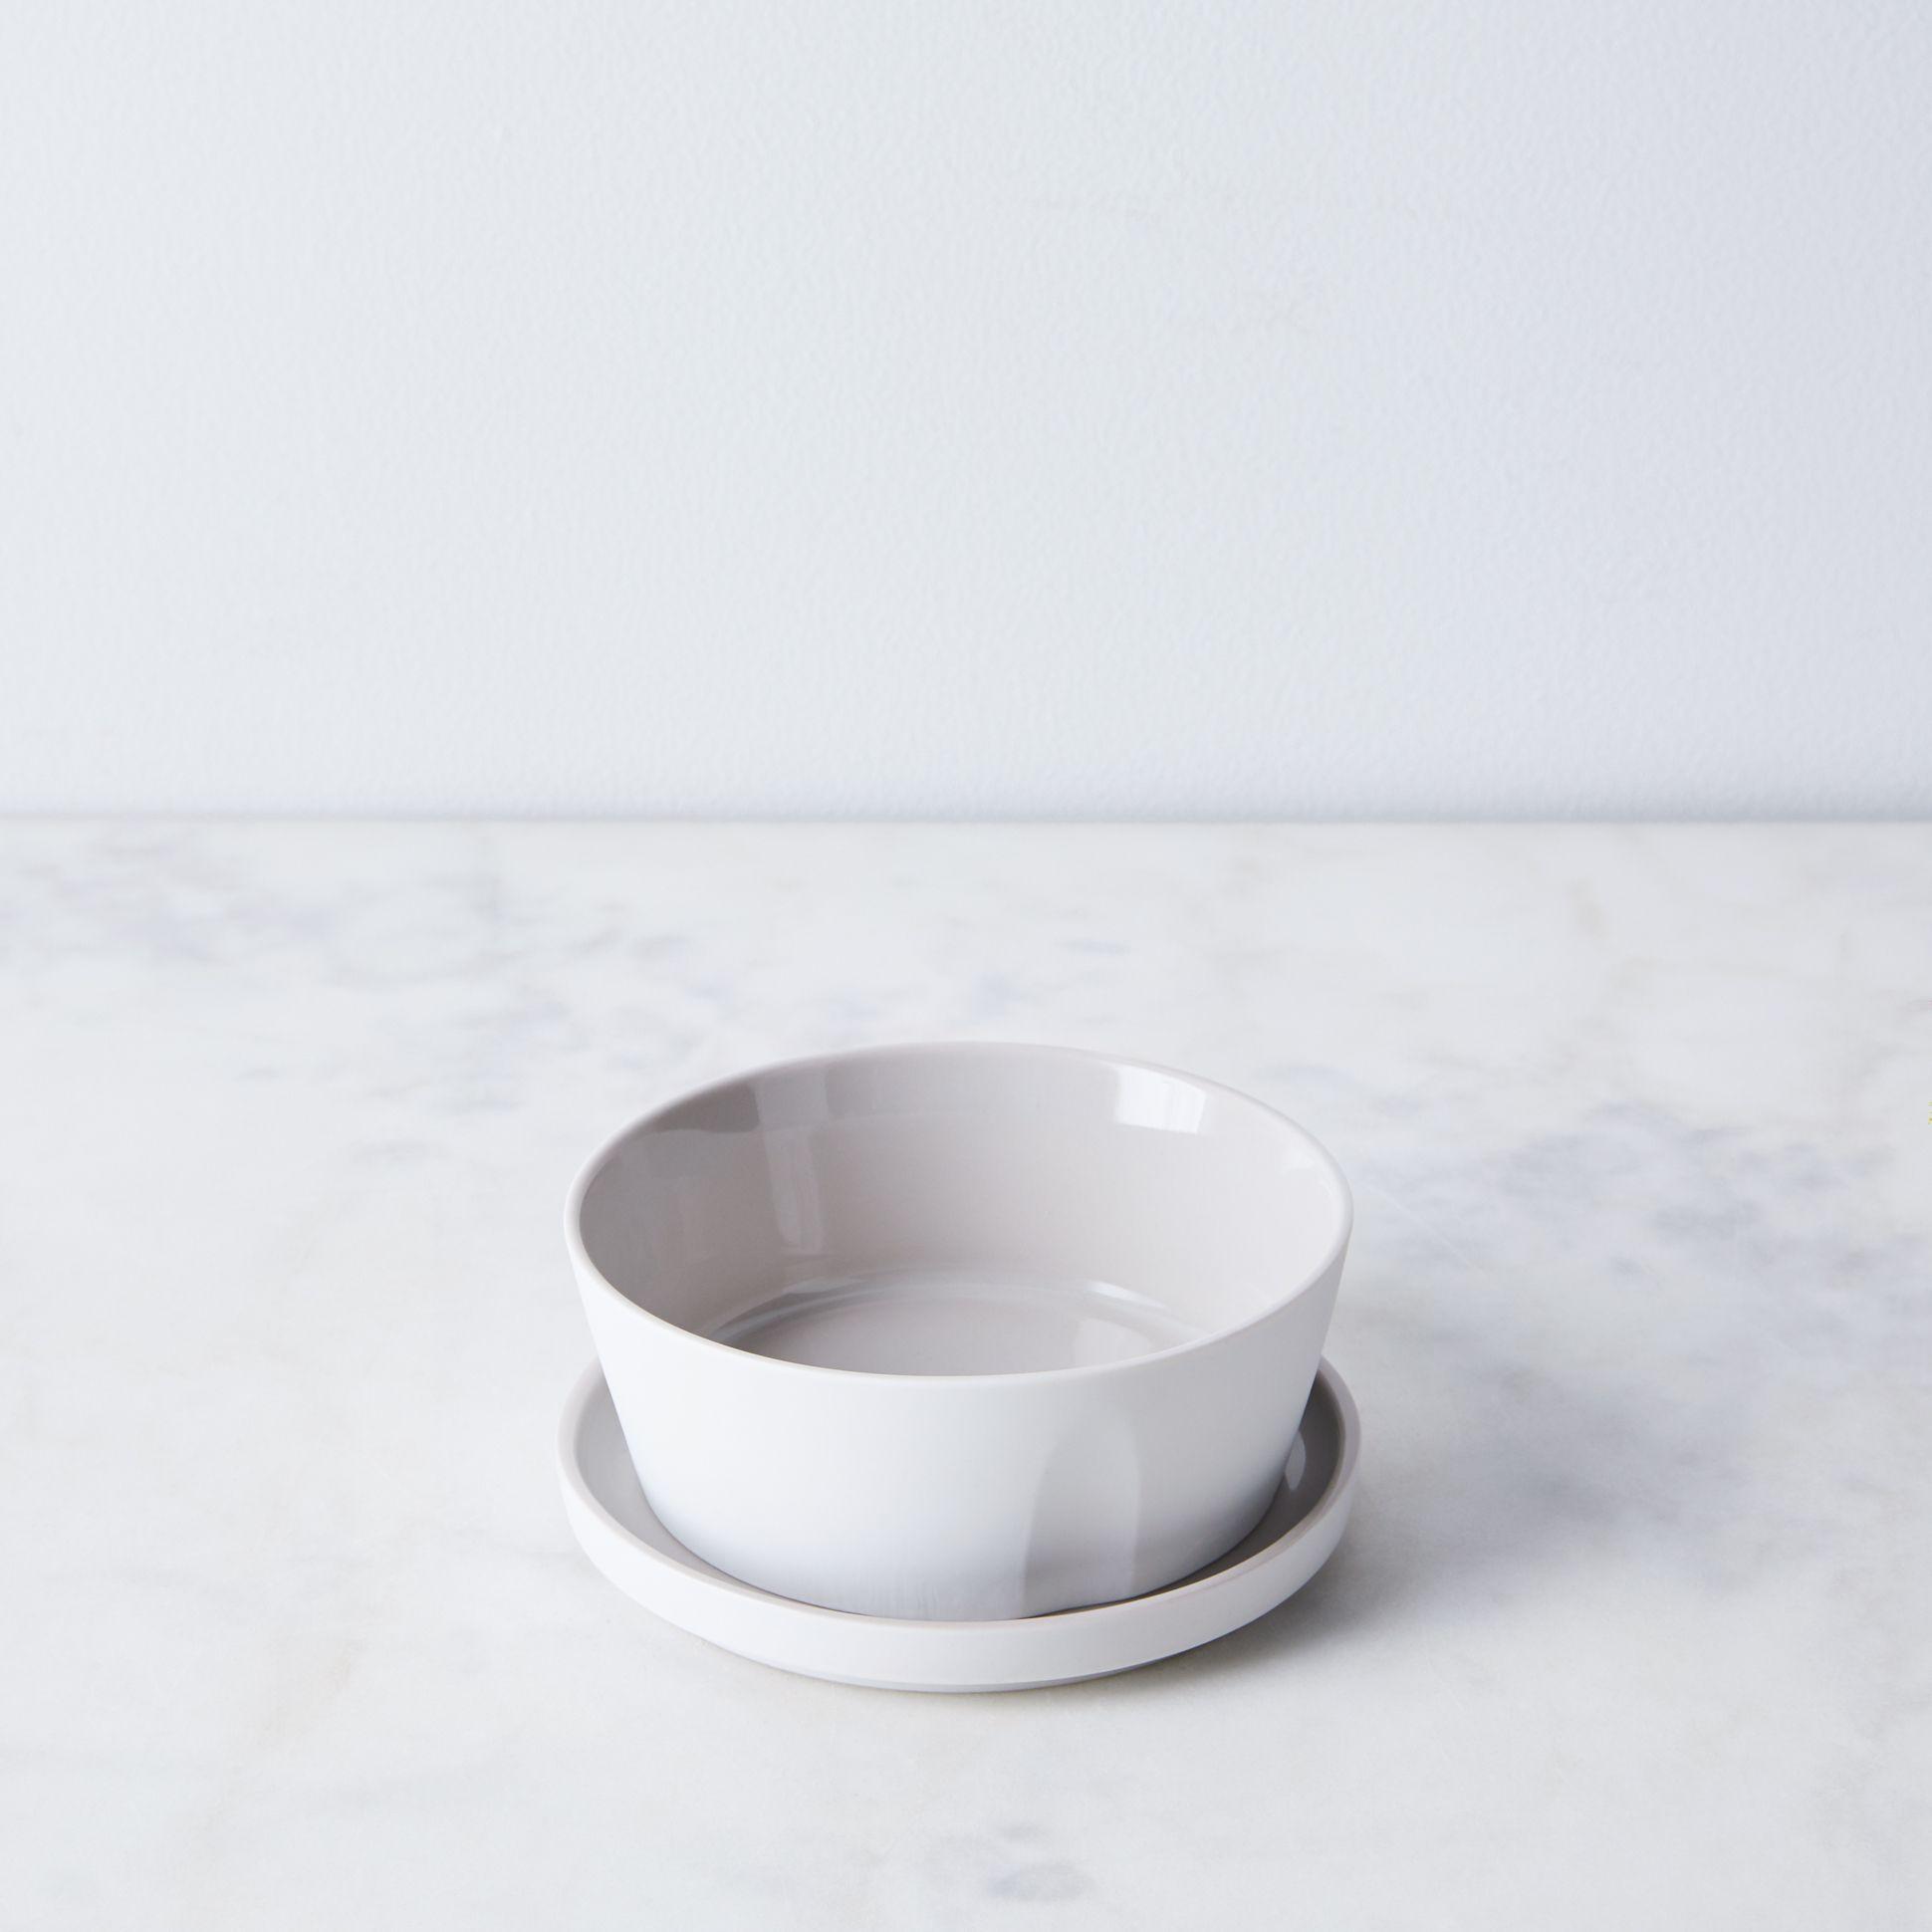 Home Goods by Cate est la cuisson